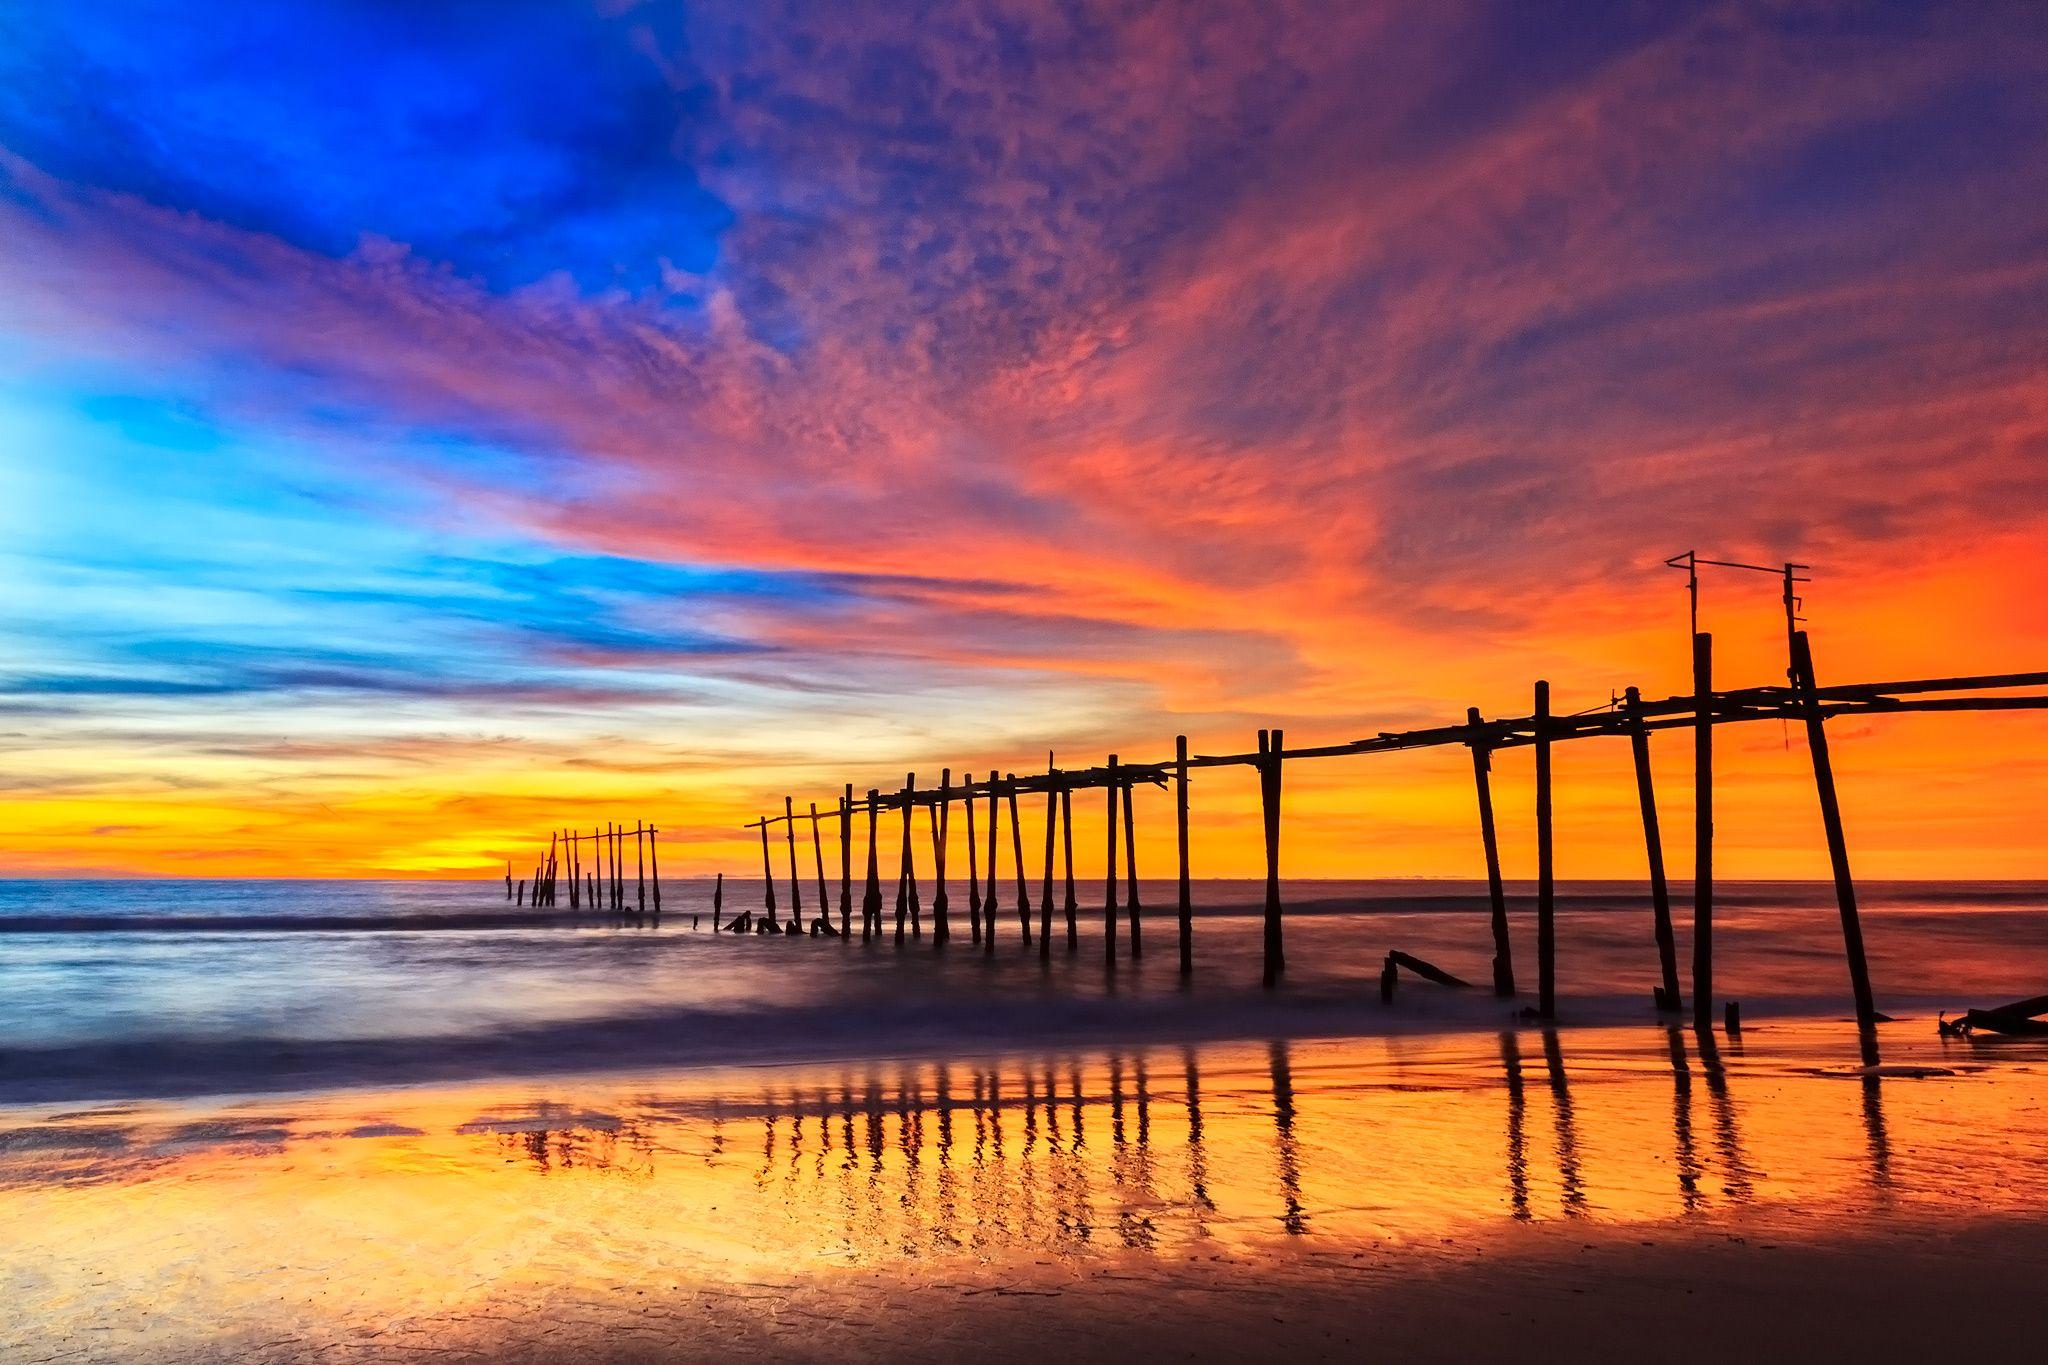 Old Bridge Pilai Beach Phang Nga Thailand by ichoo2000